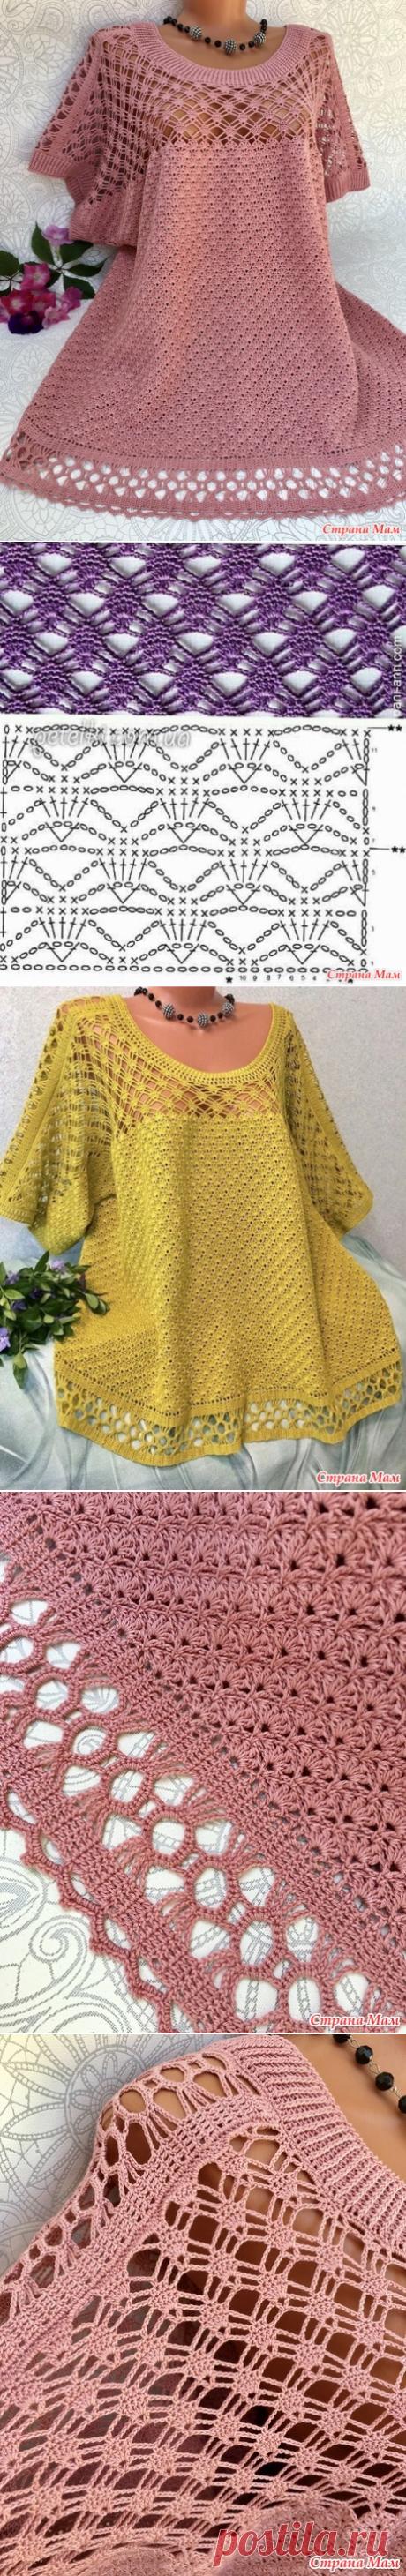 Блузоны для крупных дам крючком - Вязание - Страна Мам